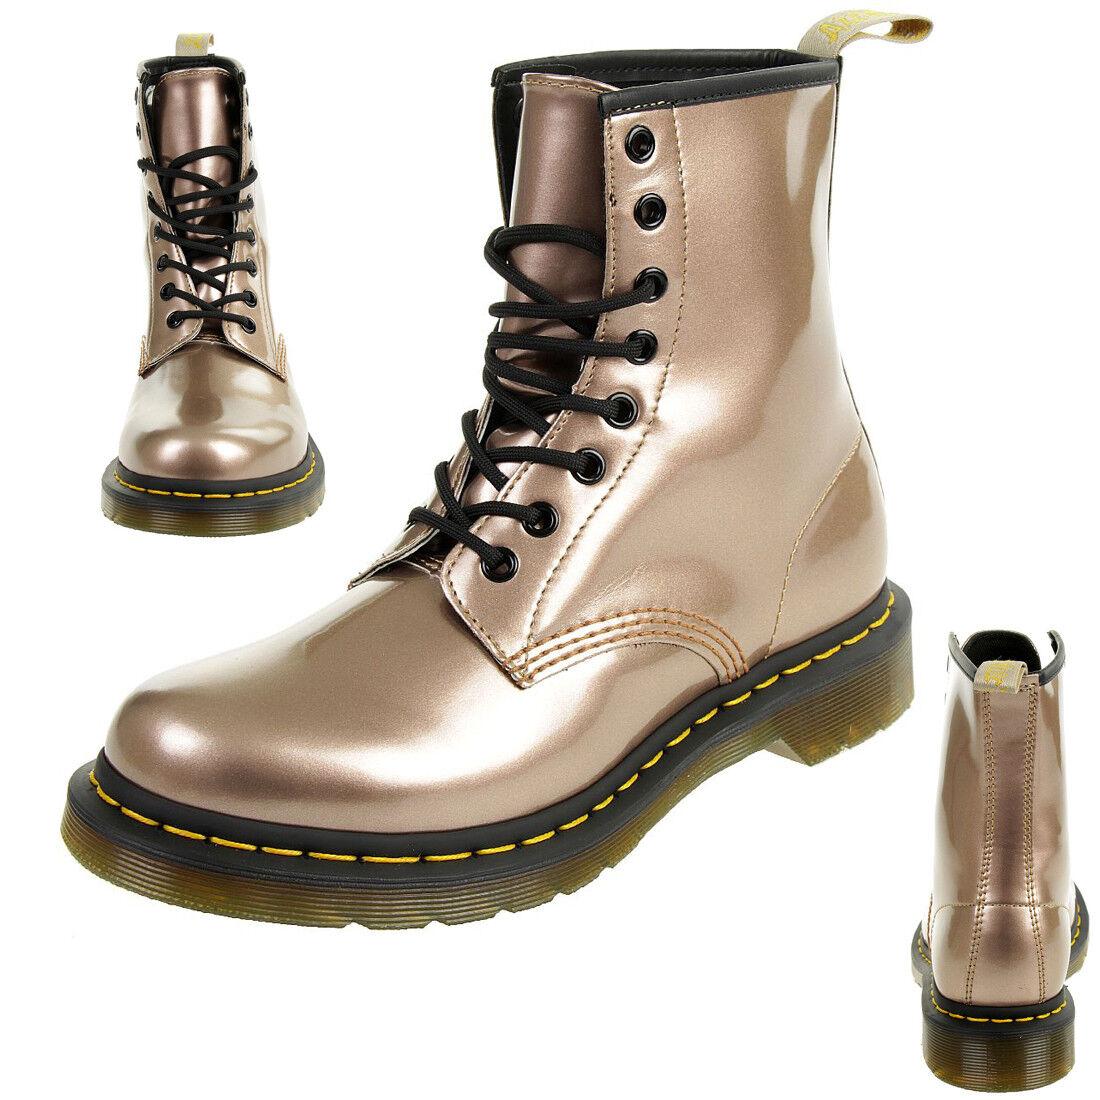 Dr. Martens 1460 Vegan Chrome señora botas metalizado rosado oro oro oro 24865716  mejor precio